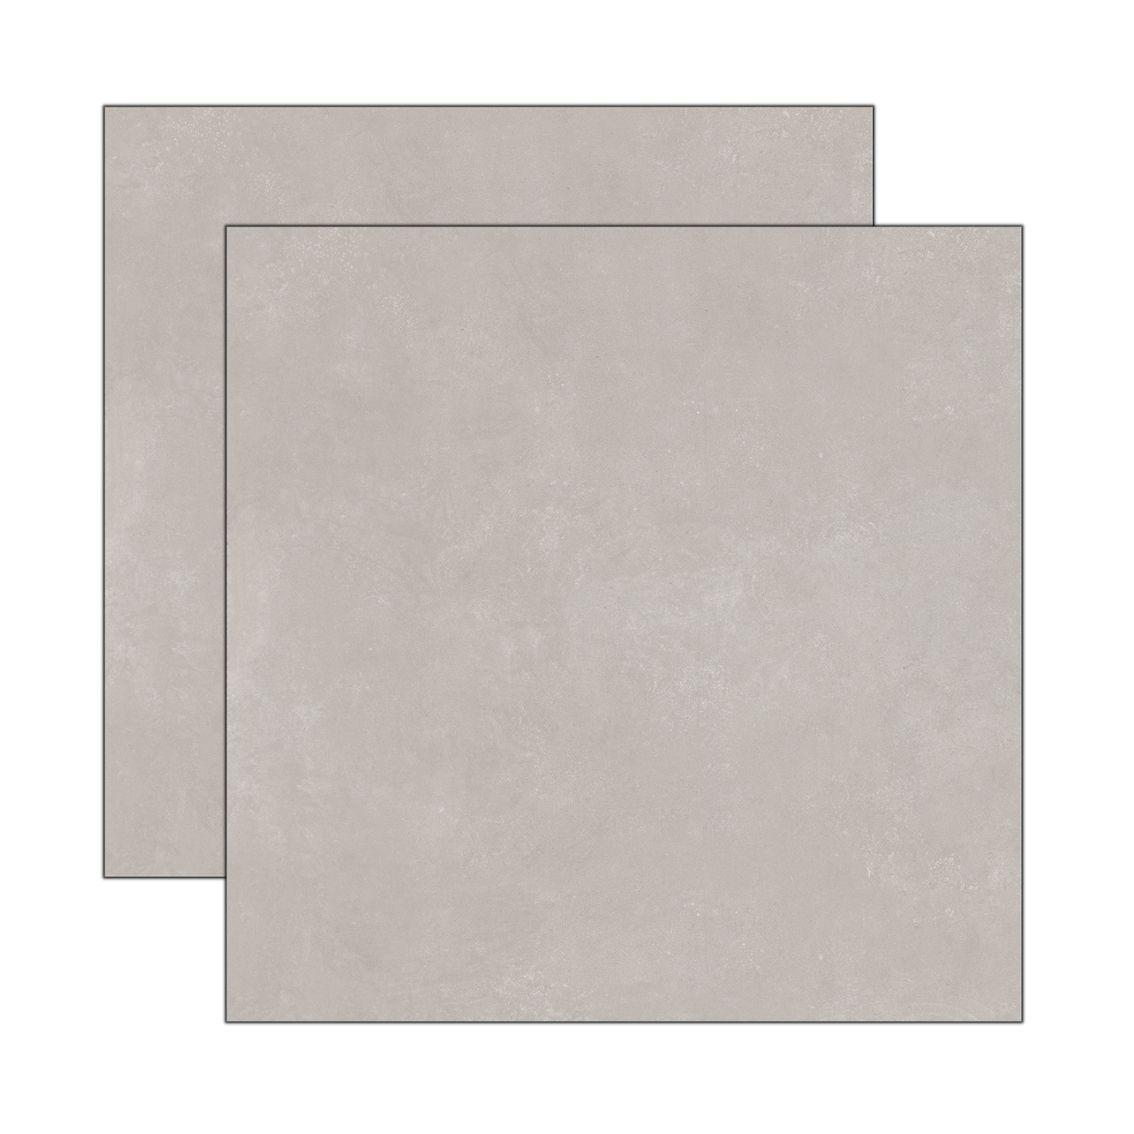 Concrete Grafite 60x60 cm <br /><b>R$ 35,90 M² </b><br />Cx 2,50 M² <b> R$ 89,75</b>